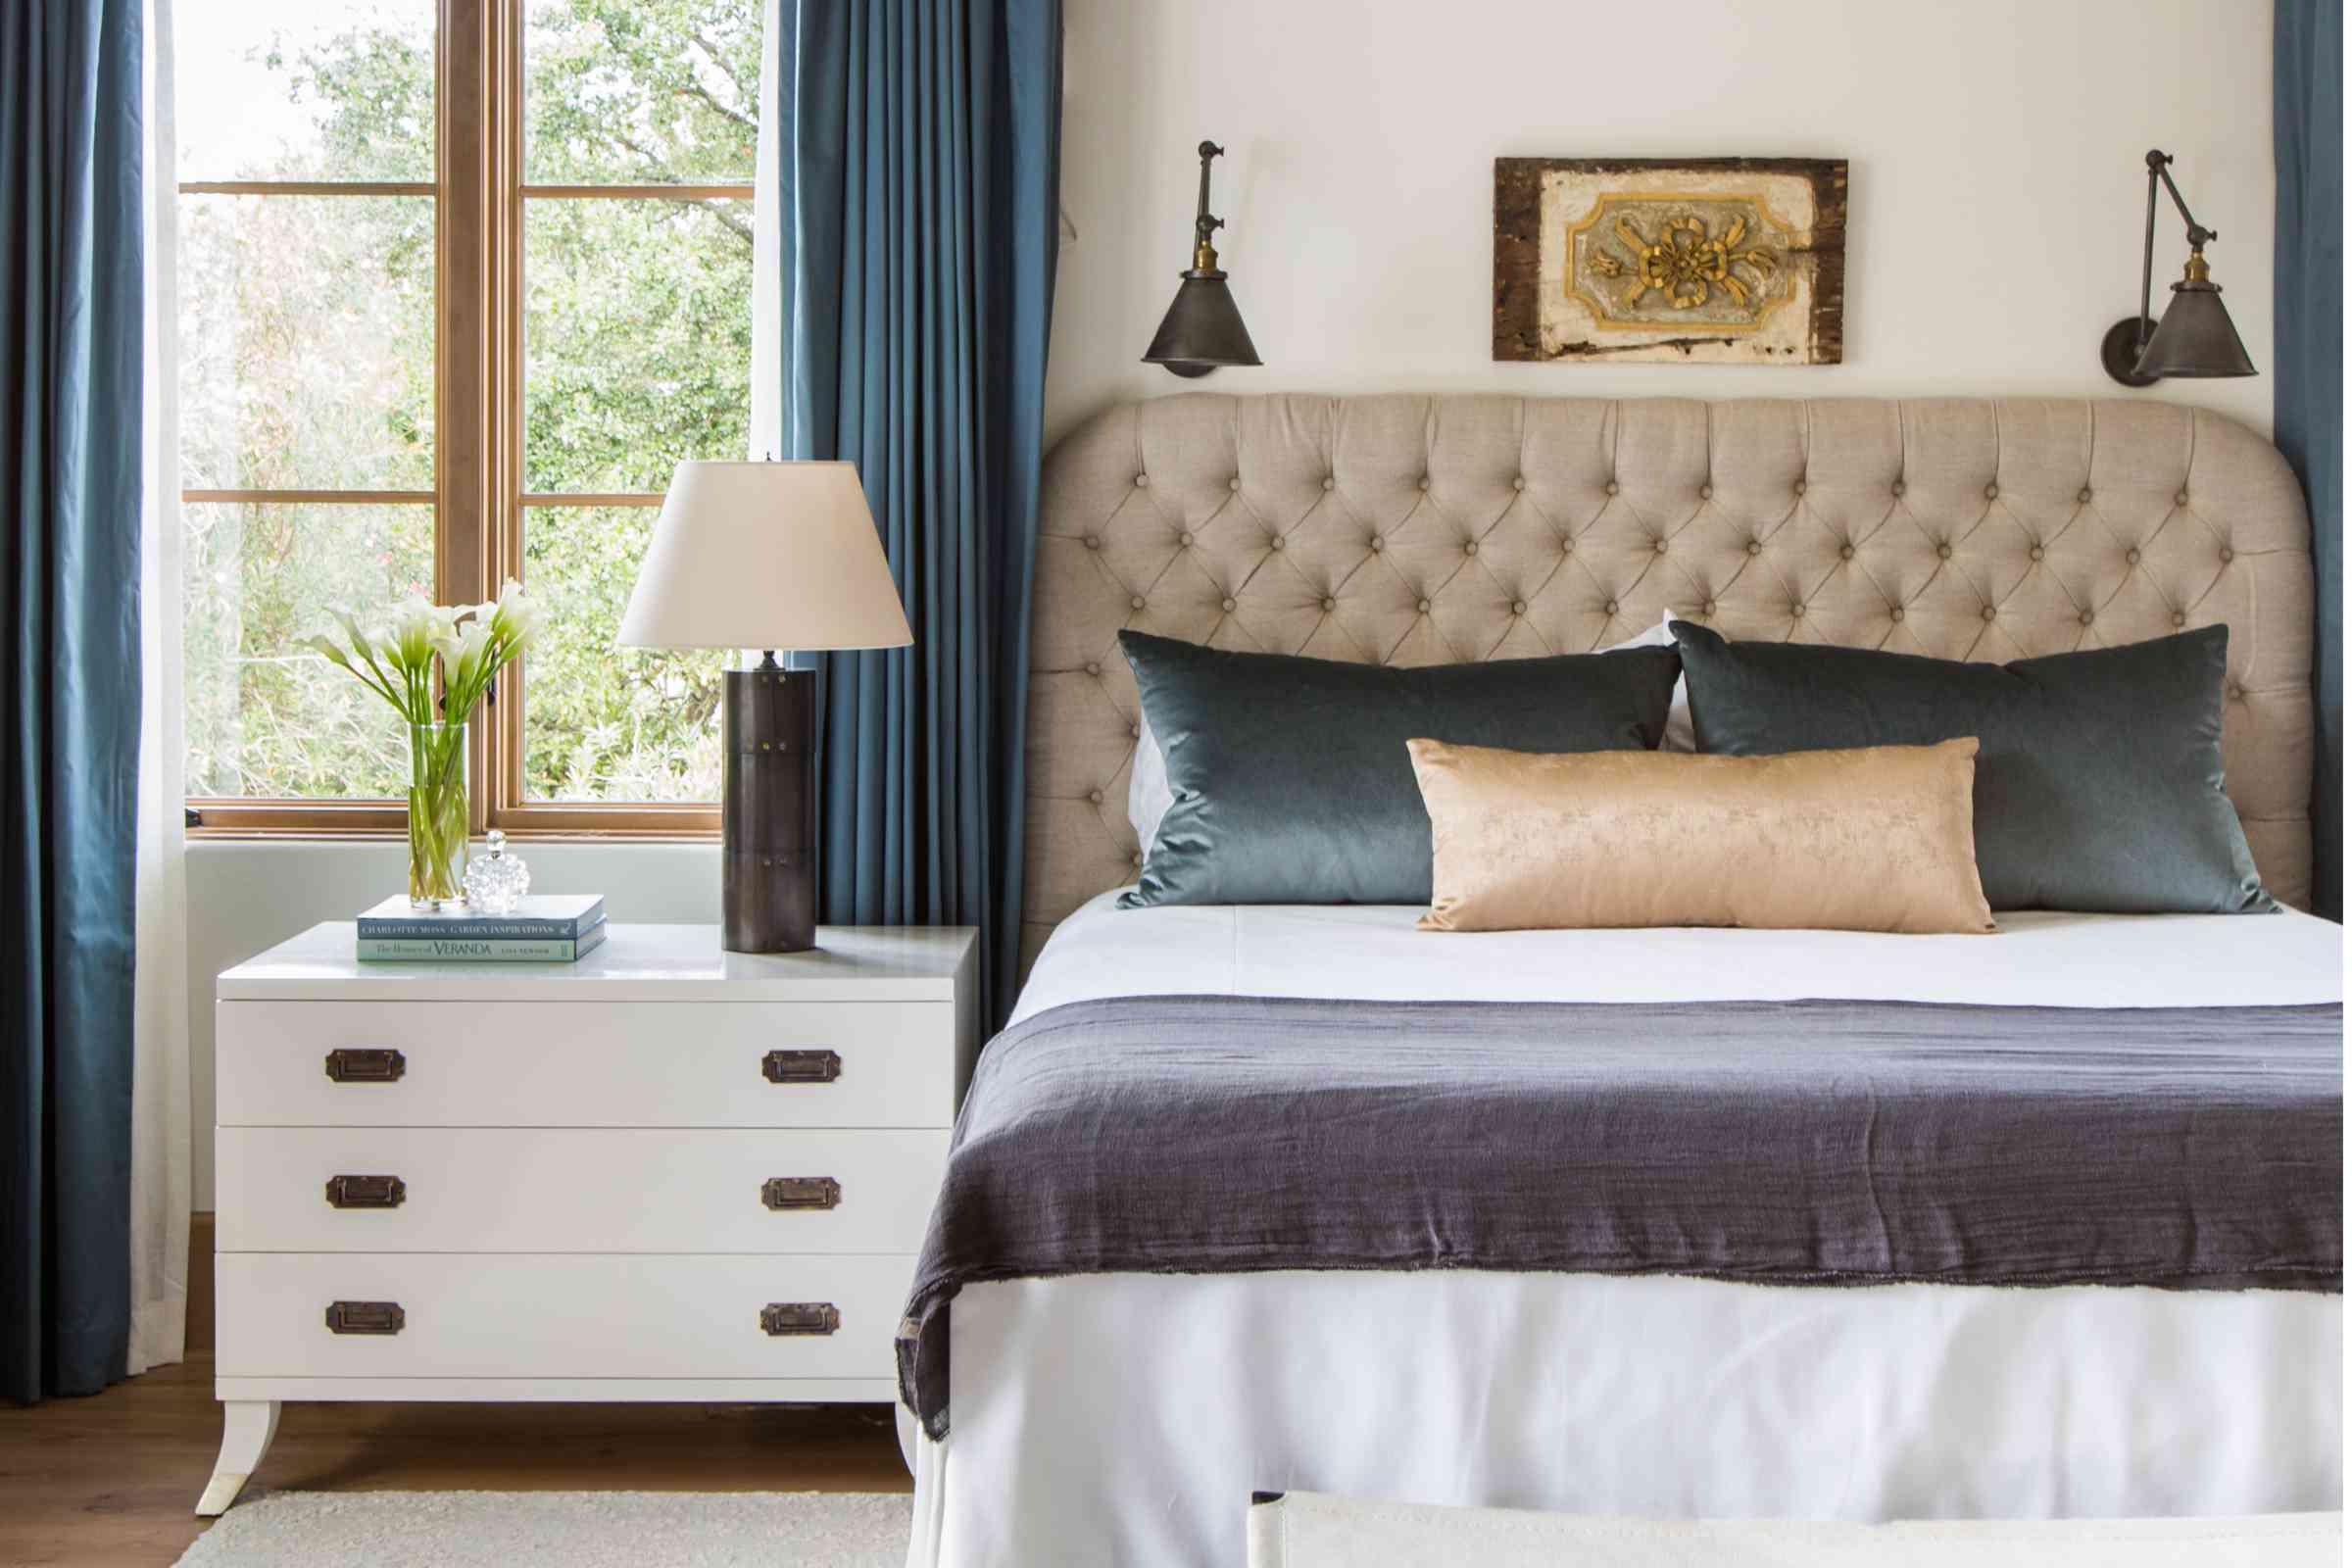 Bedroom with mix of dark blues